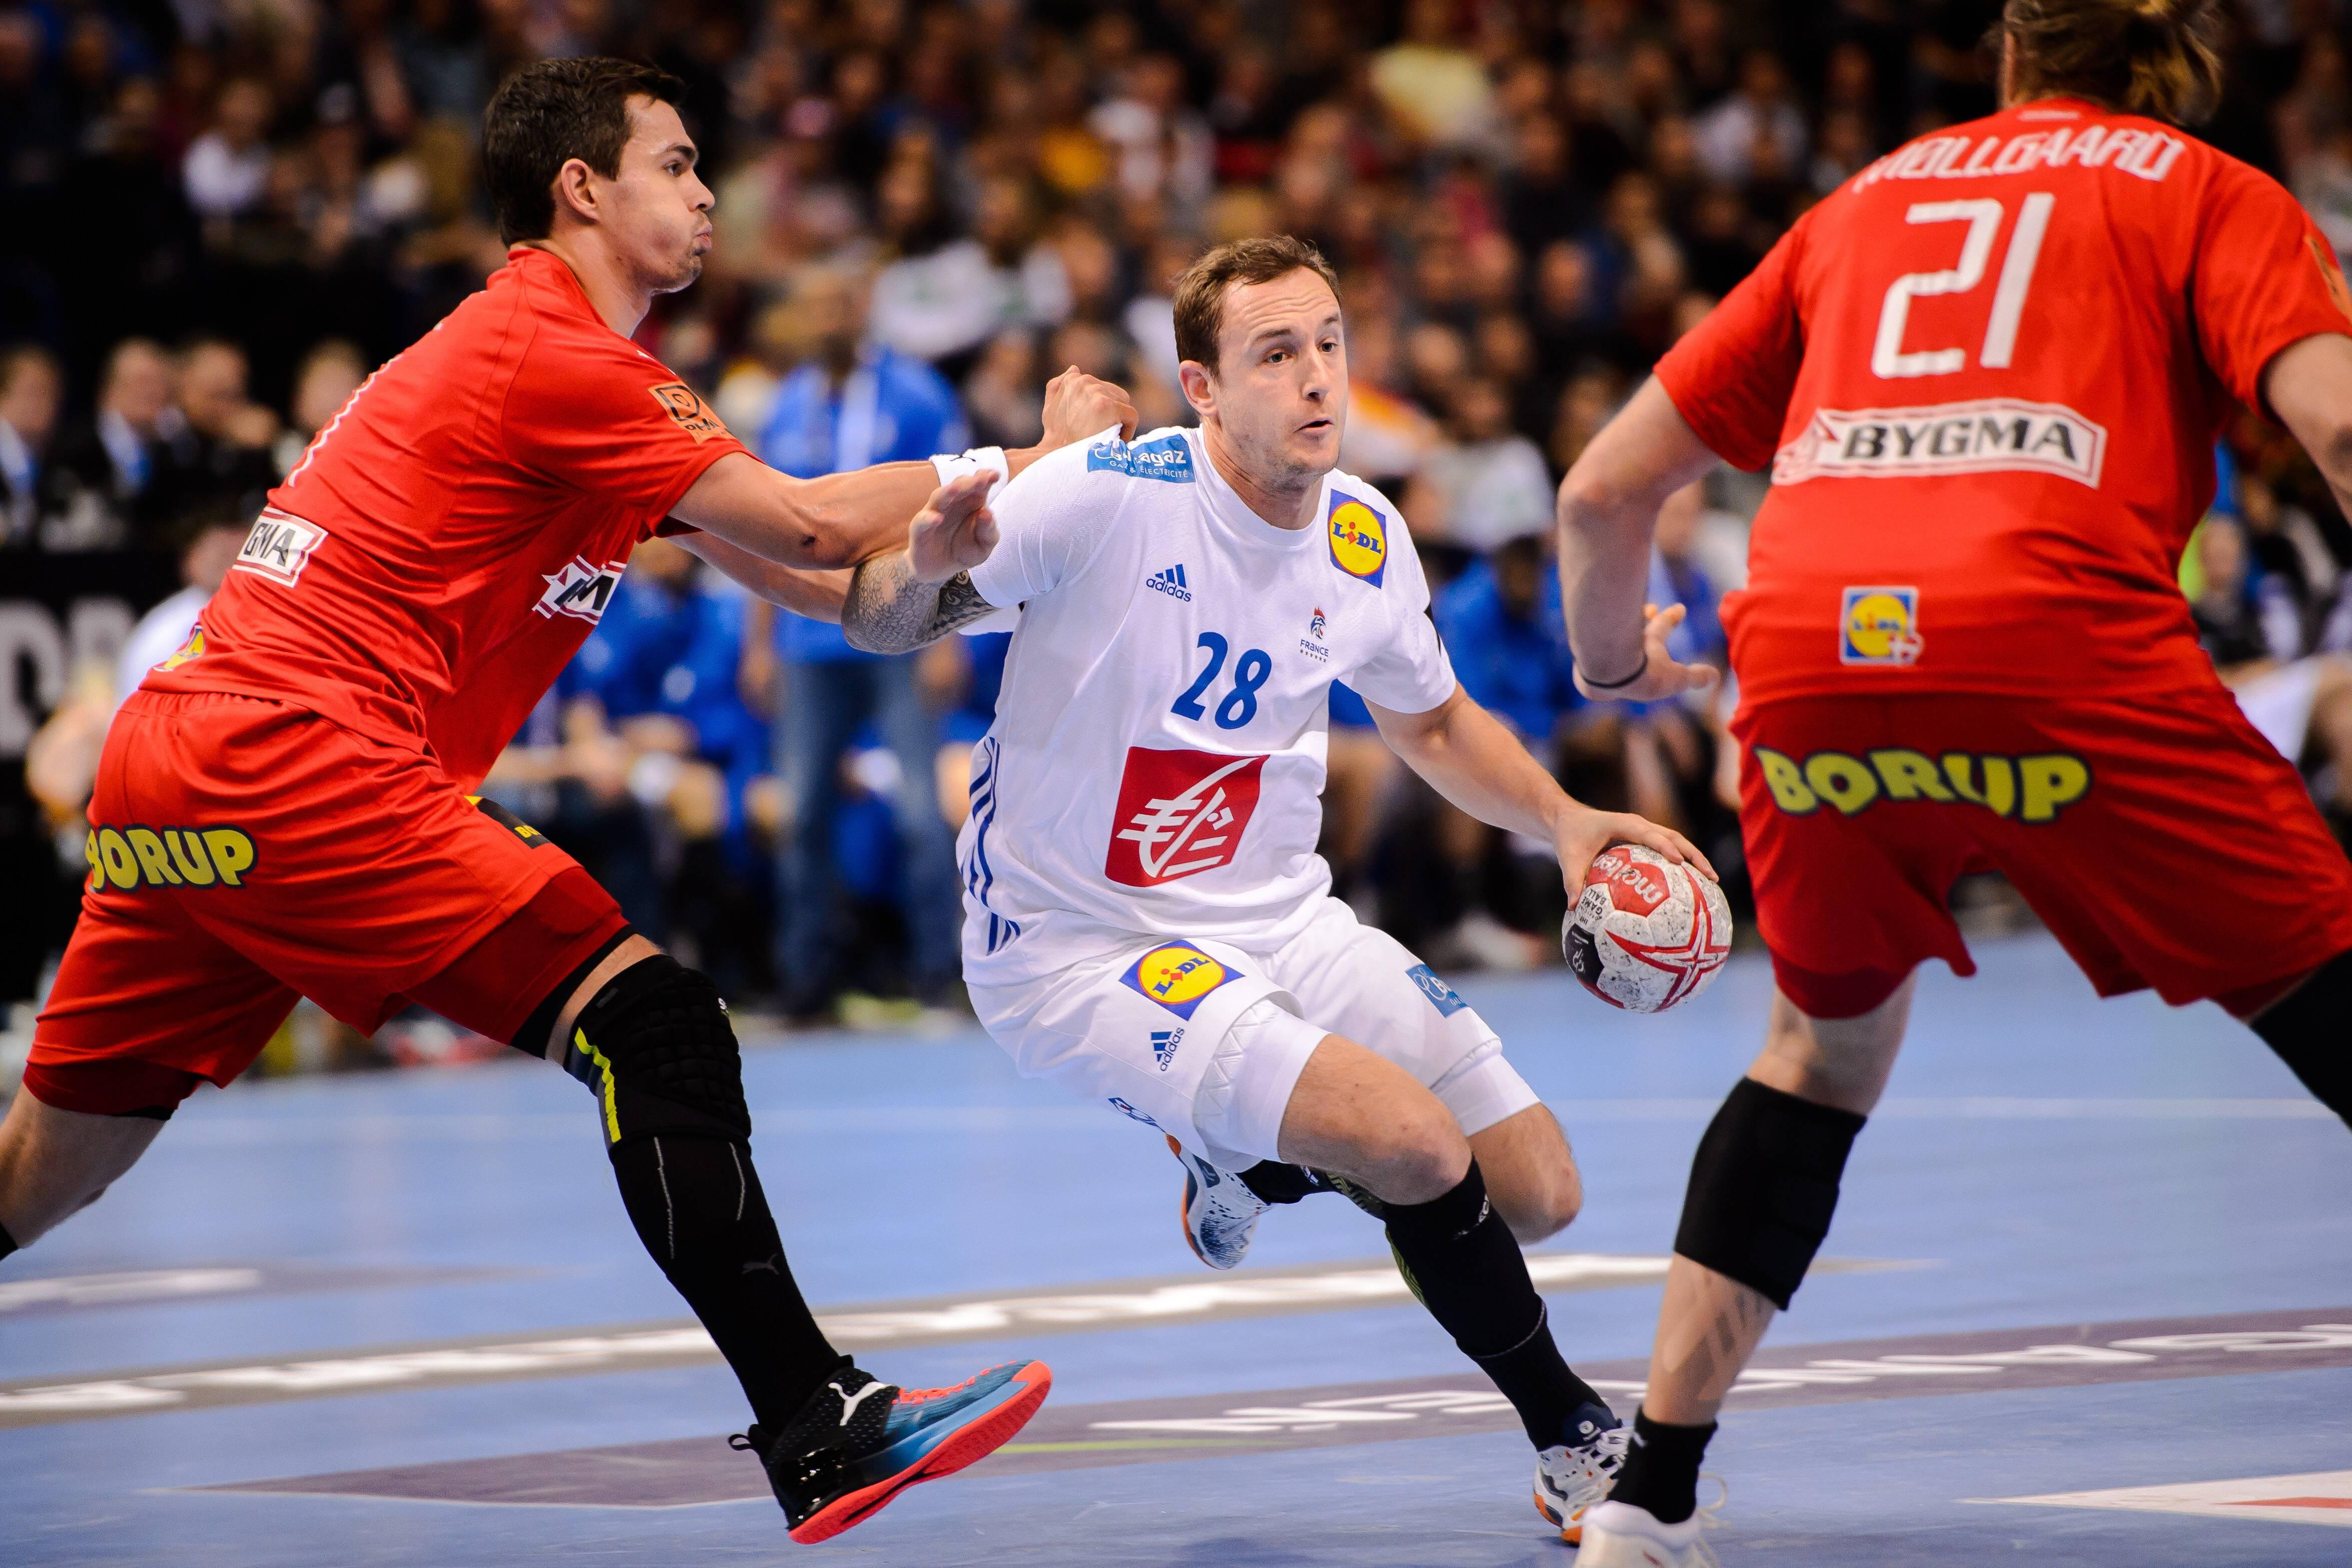 Handball - Equipe de France - Mondial 2019 : pour Valentin Porte, «il n'y a pas eu photo»